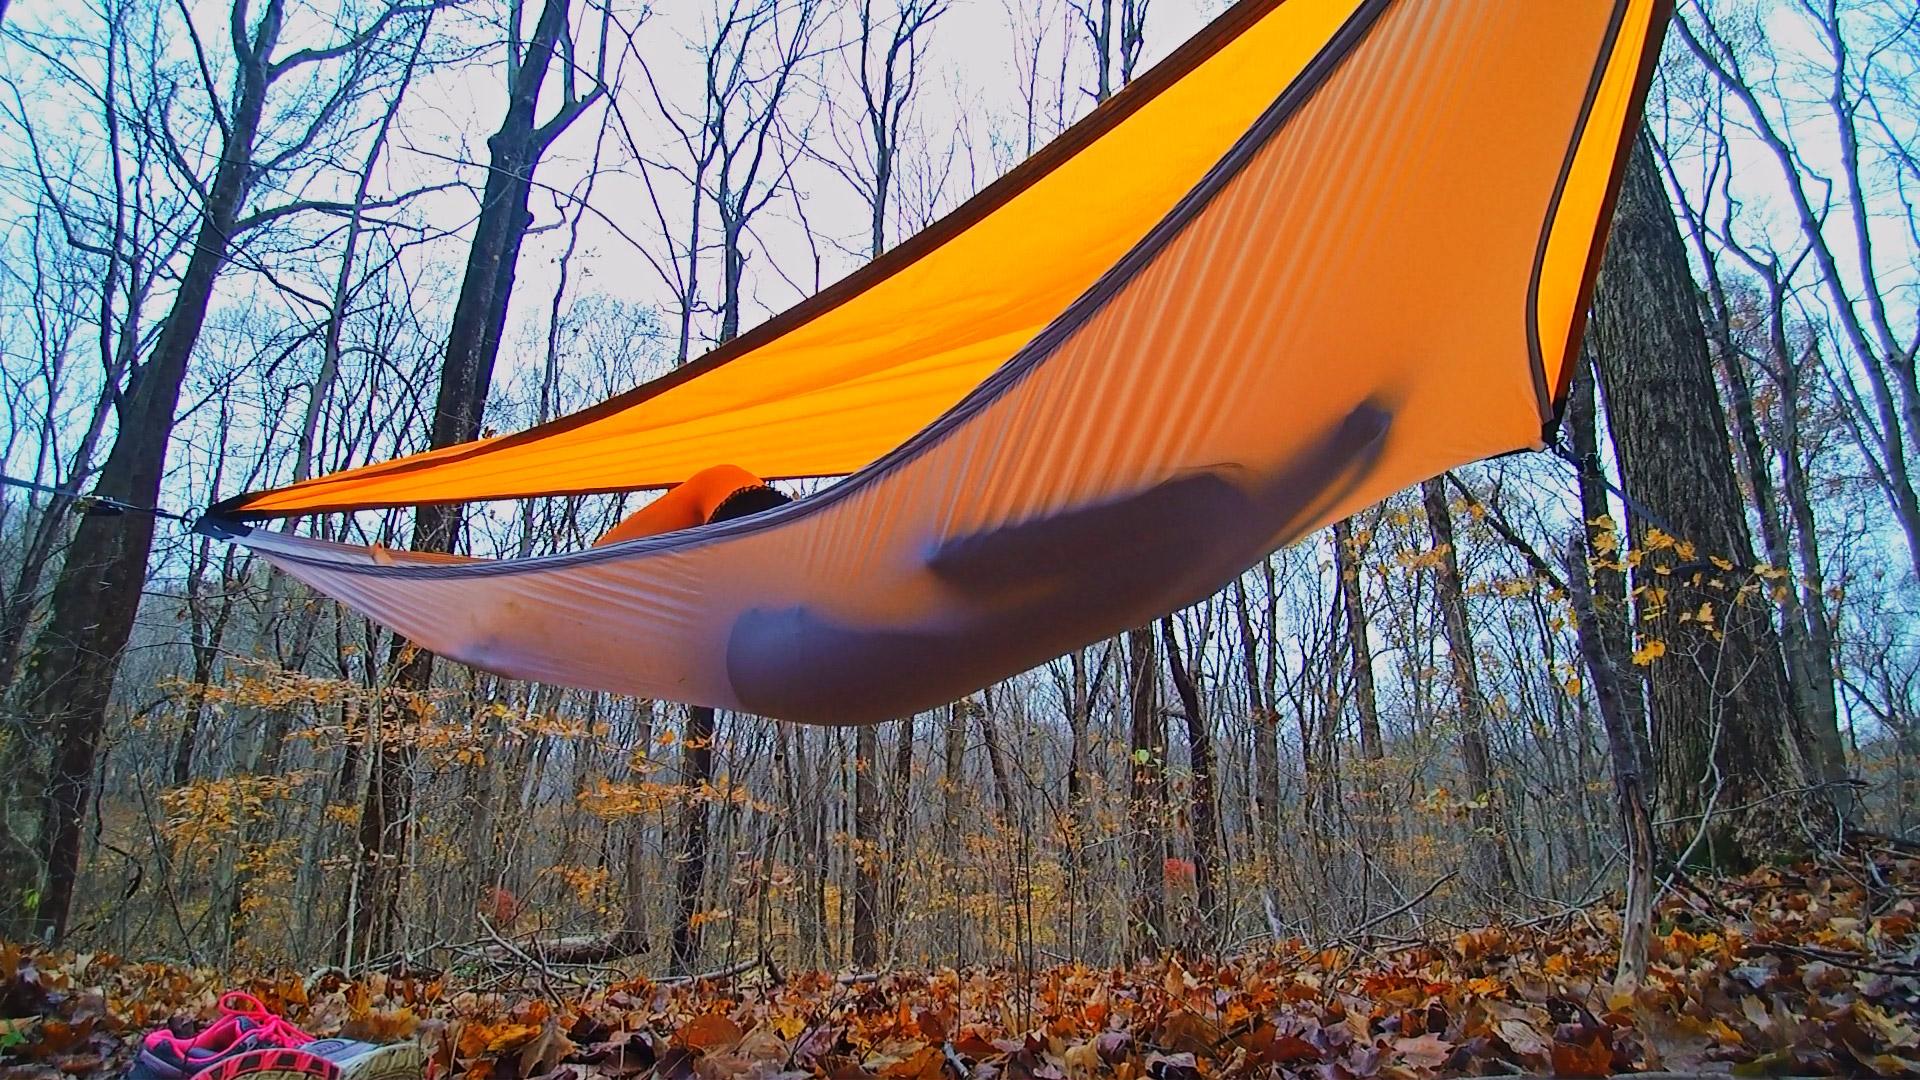 Two hammocks double as a sunshade